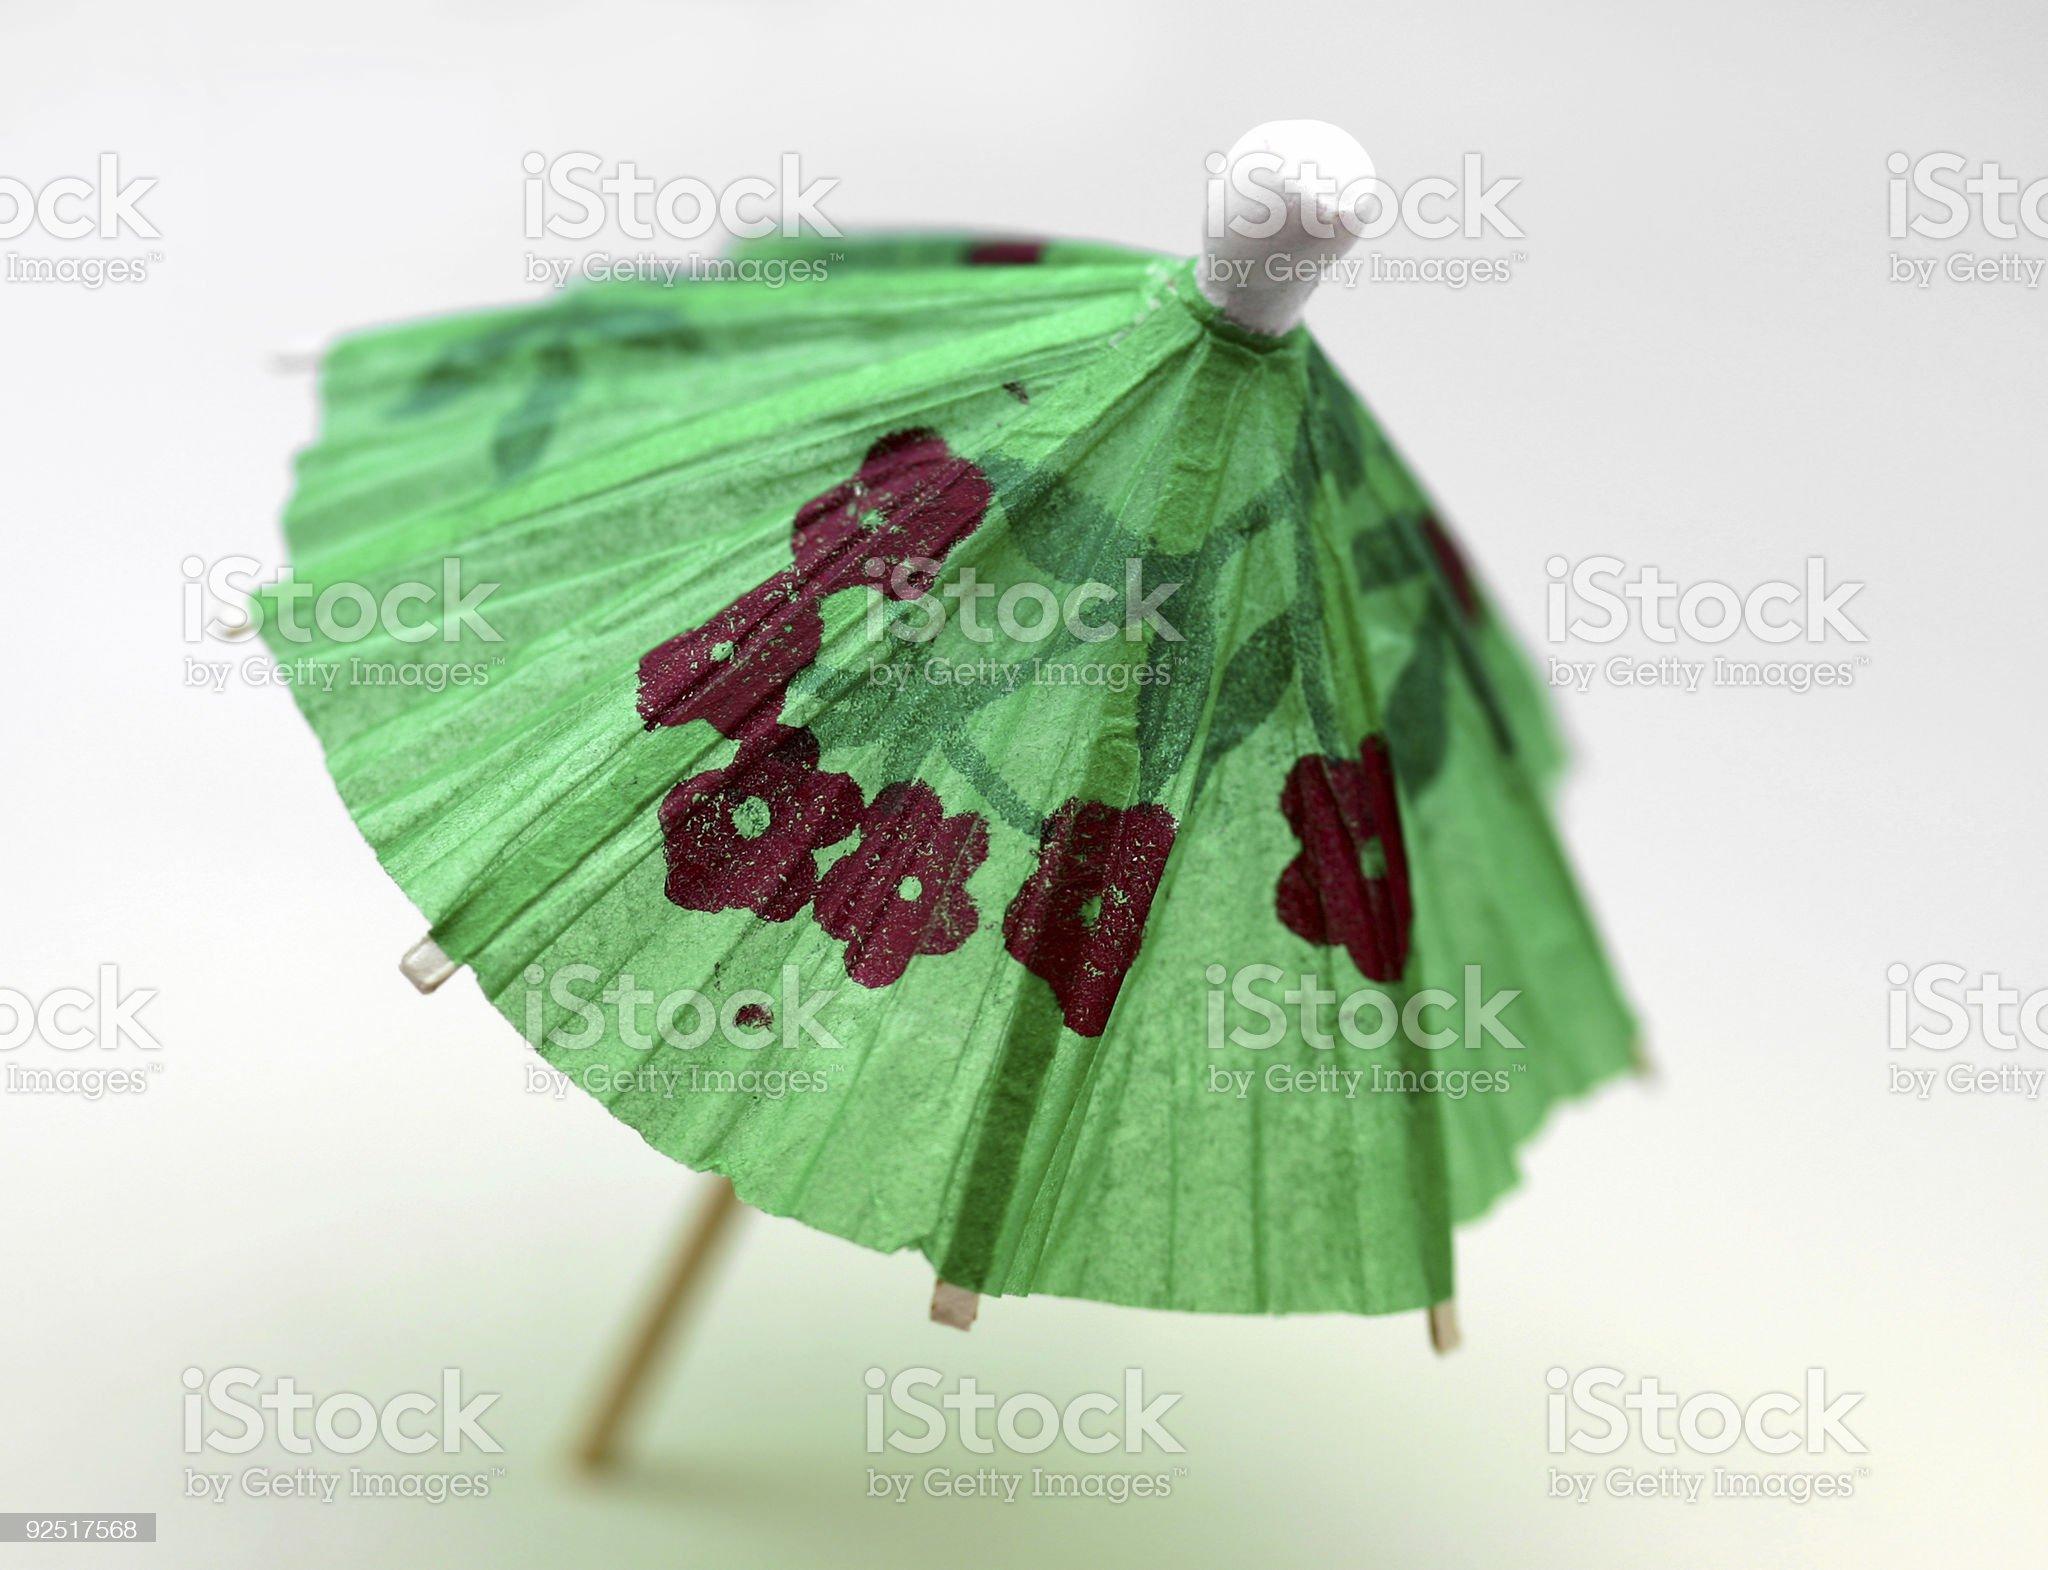 cocktail umbrella, green royalty-free stock photo